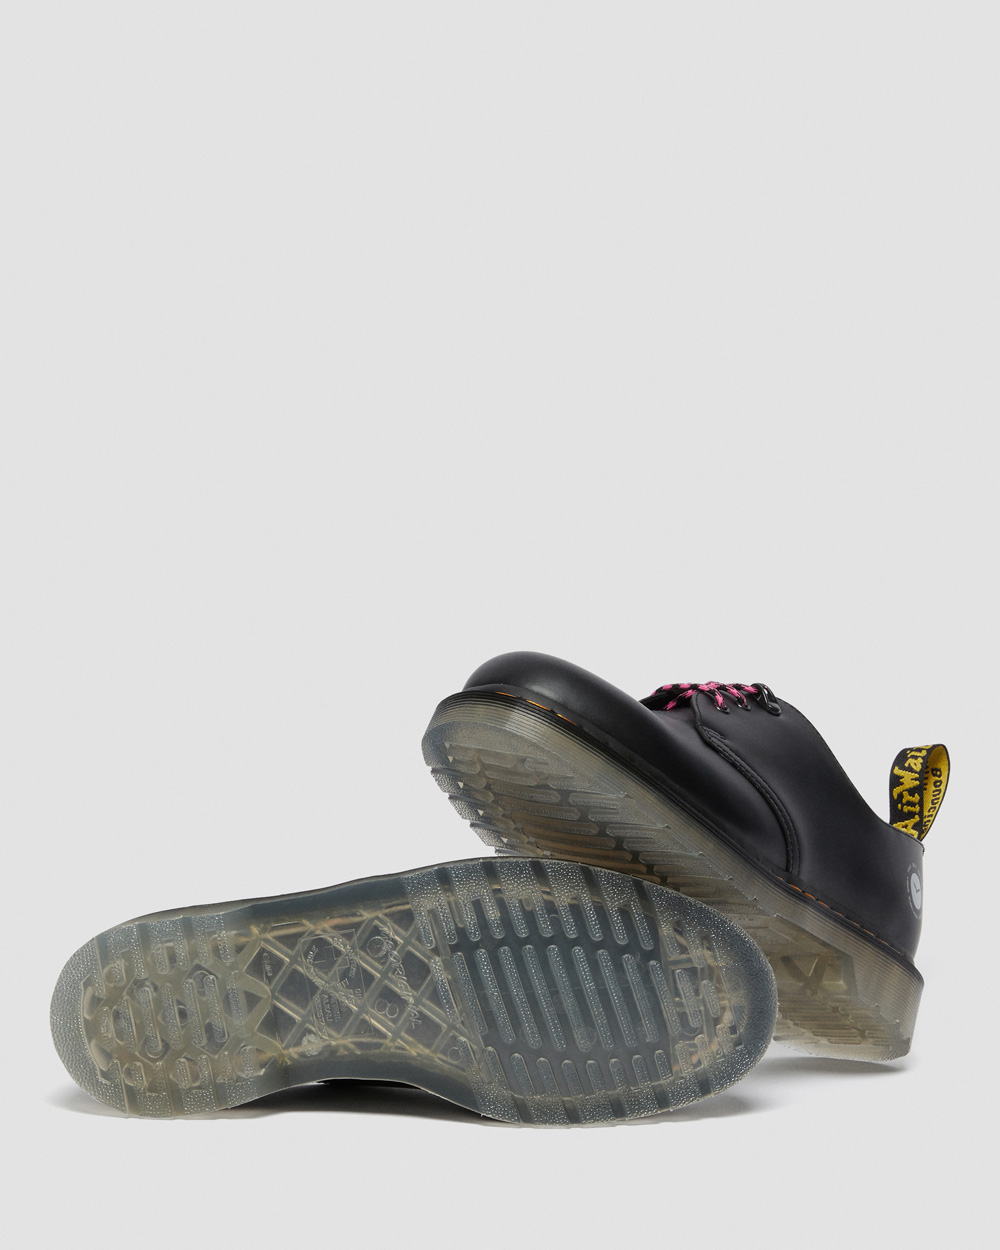 atmos,Dr. Martens,发售  atmos 联名新鞋本周发售!这次的鞋型可是难得一见!